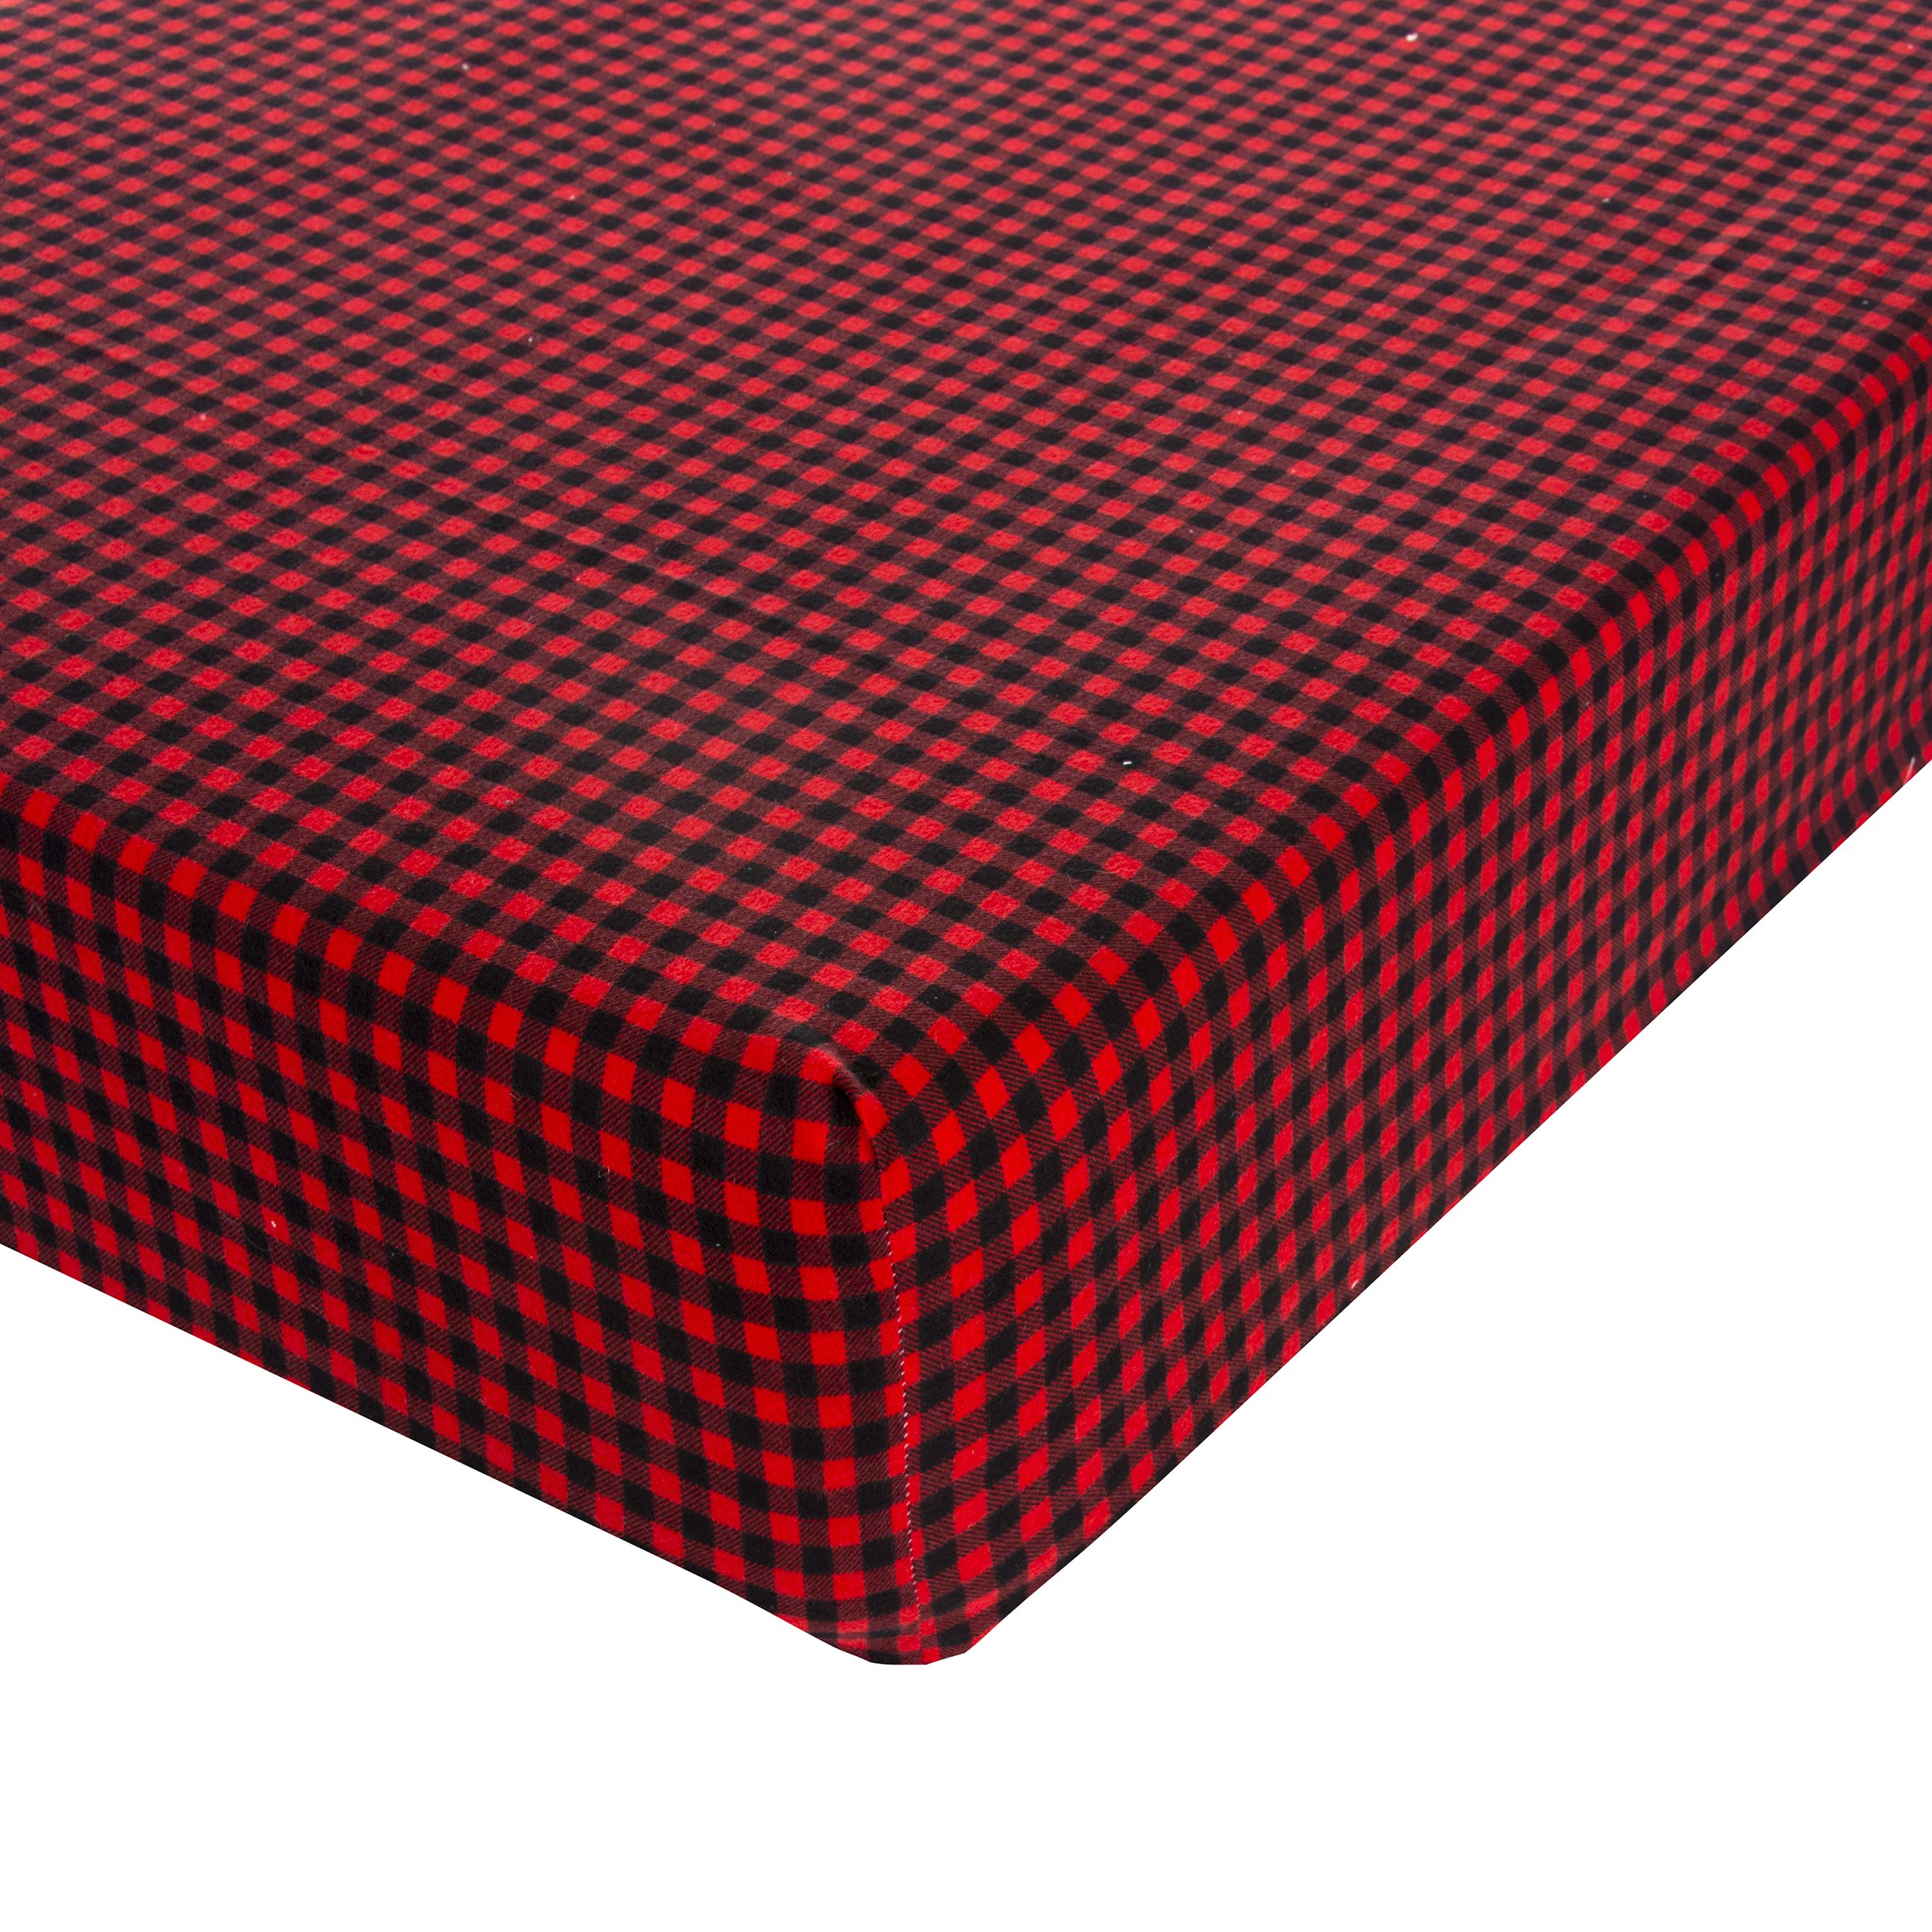 Glenna Jean Flannel Check Crib Sheet Fitted 28''x52''x8'' Nursery Standard